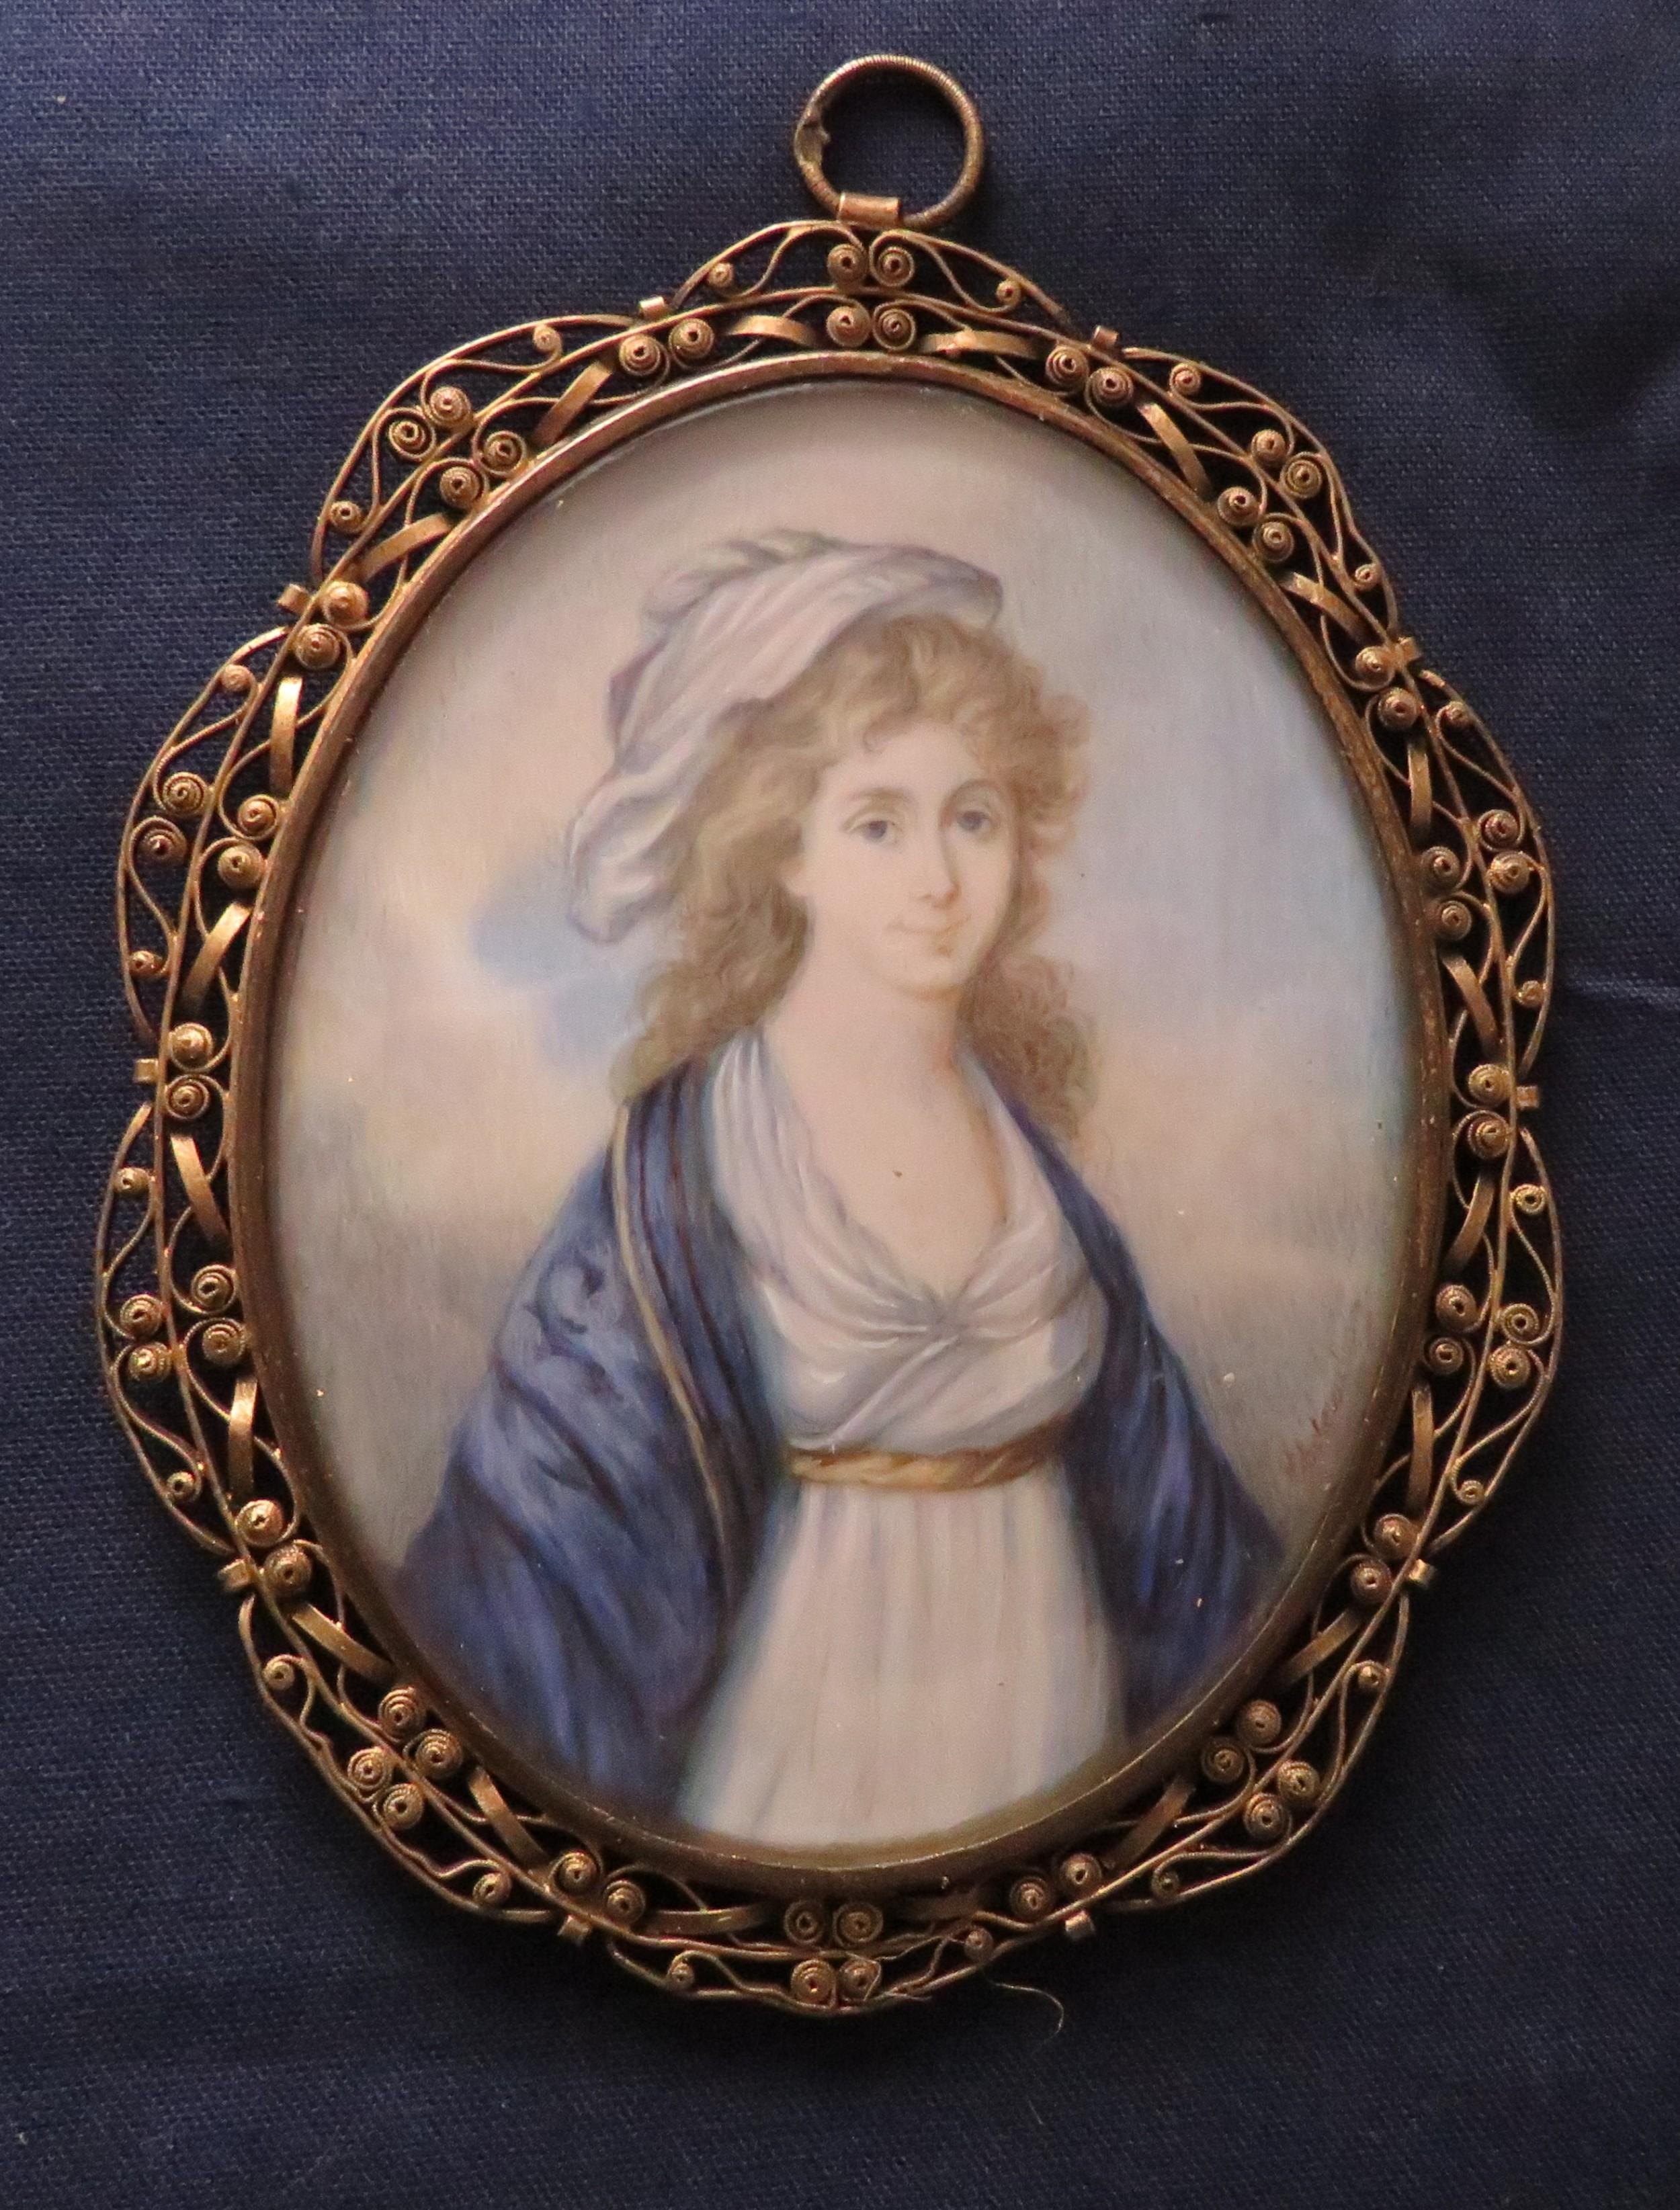 regency miniature portrait in filigree frame gold initials on reverse